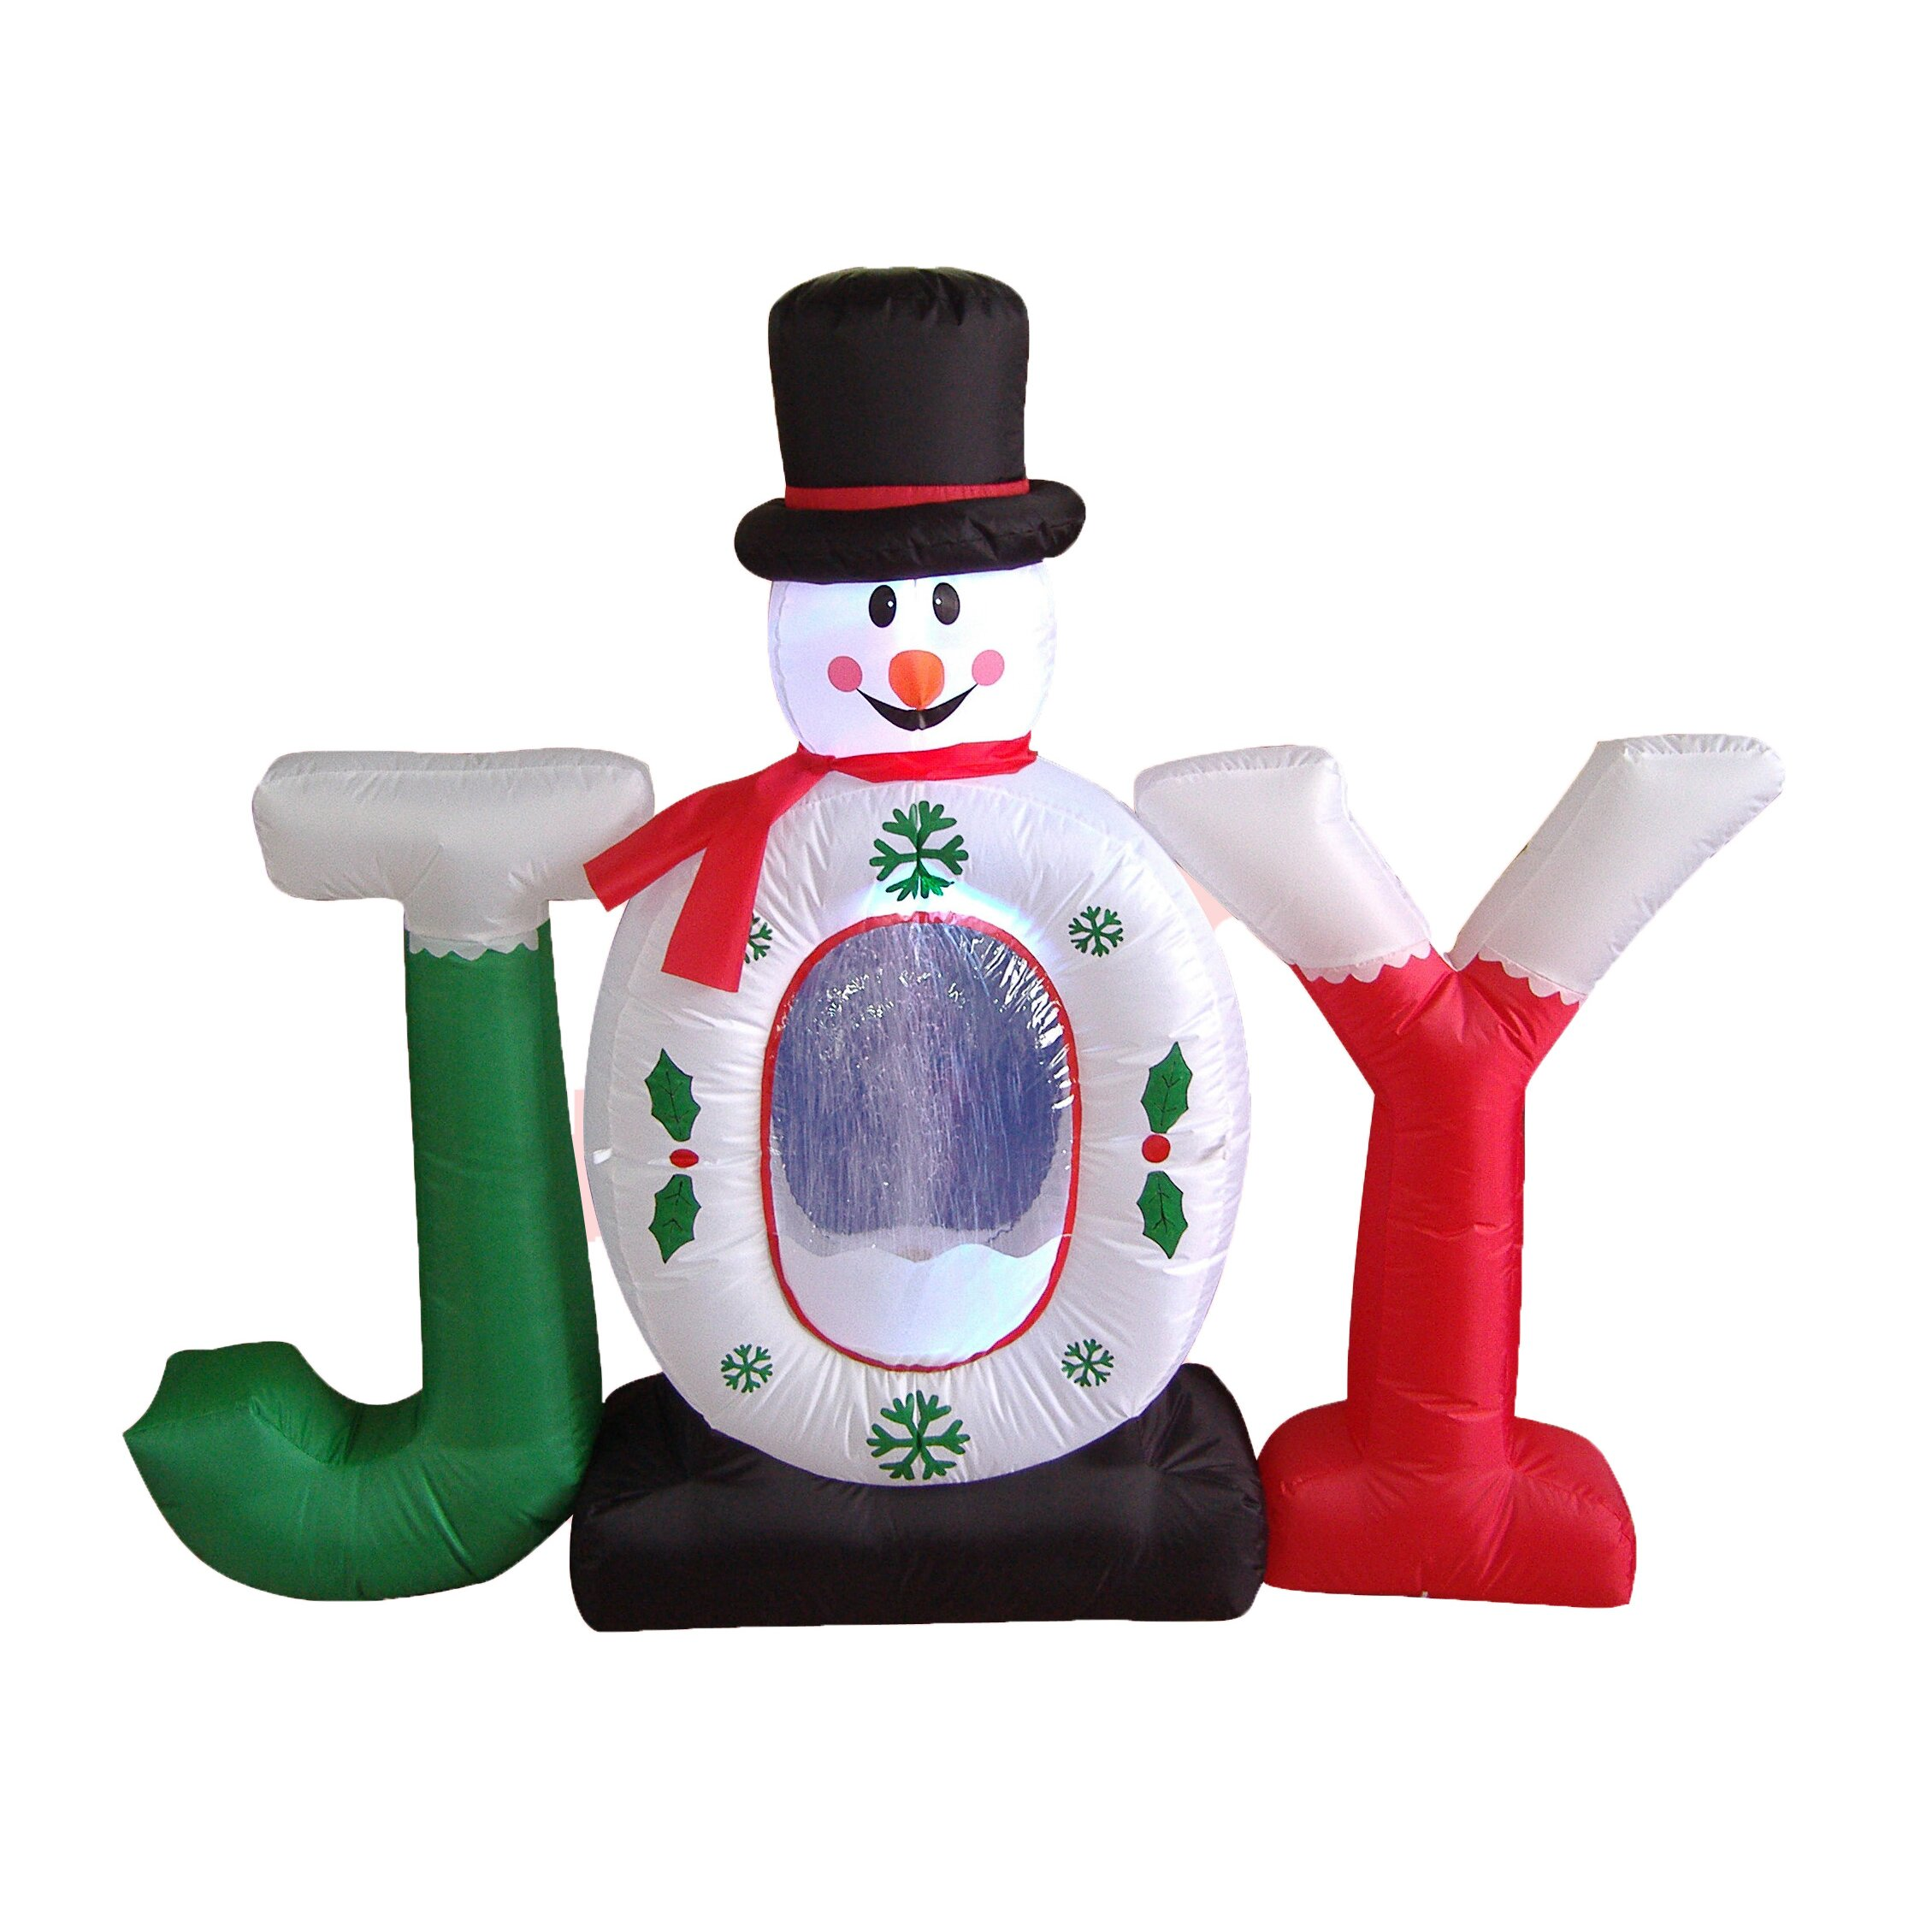 Bzb Goods Christmas Inflatable Joy Snowman Snow Globe